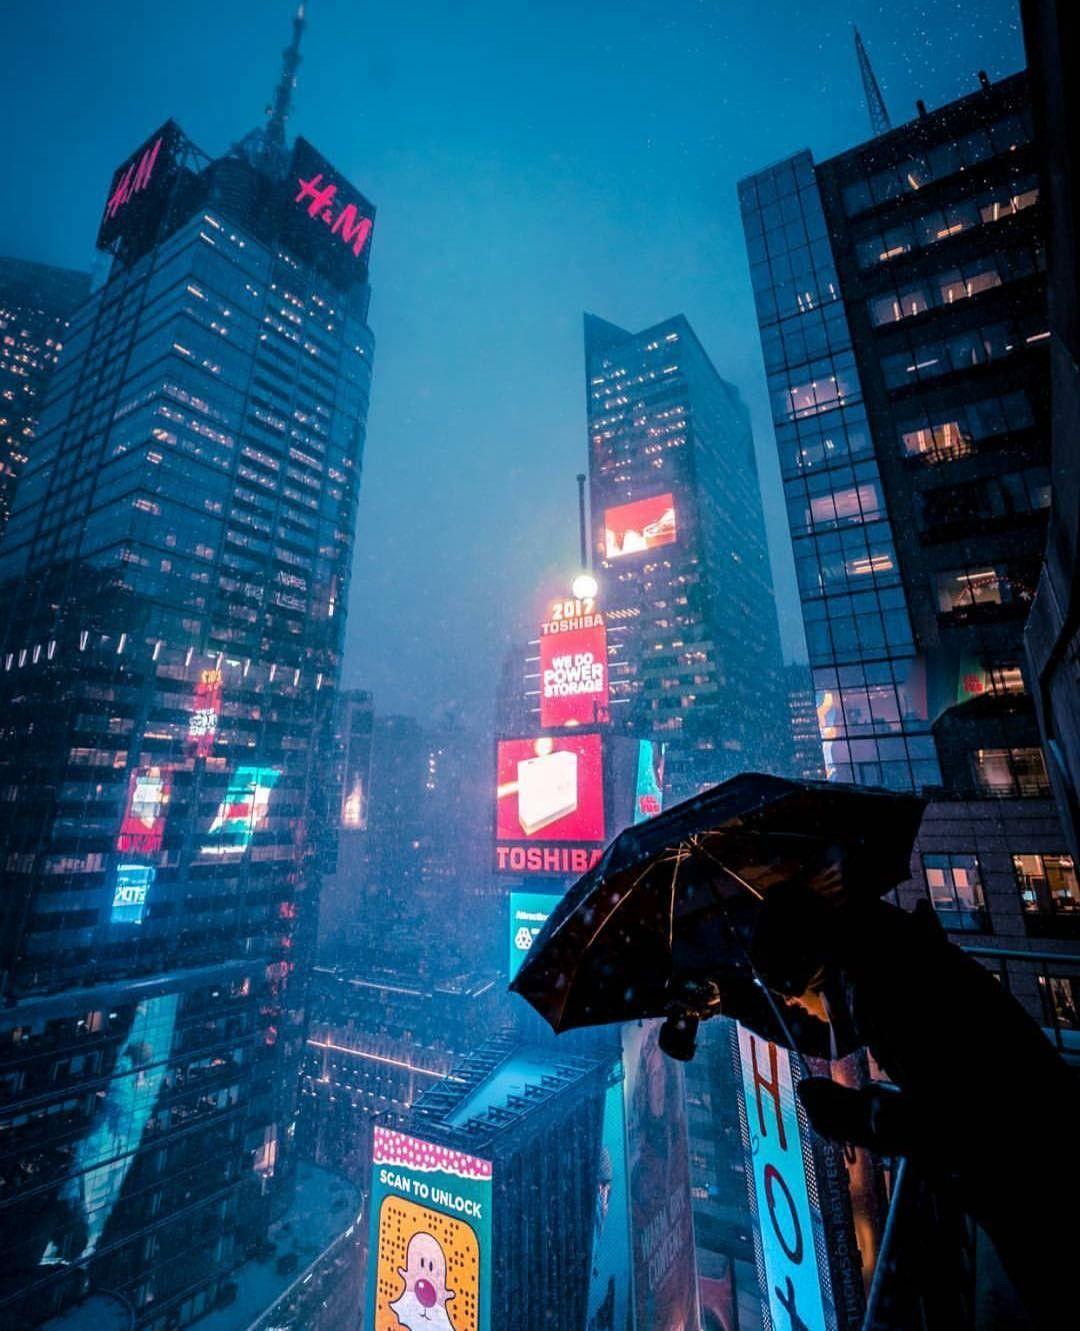 Pin By James Dunphy On Cassie Reach Cyberpunk City Futuristic City Cyberpunk Aesthetic